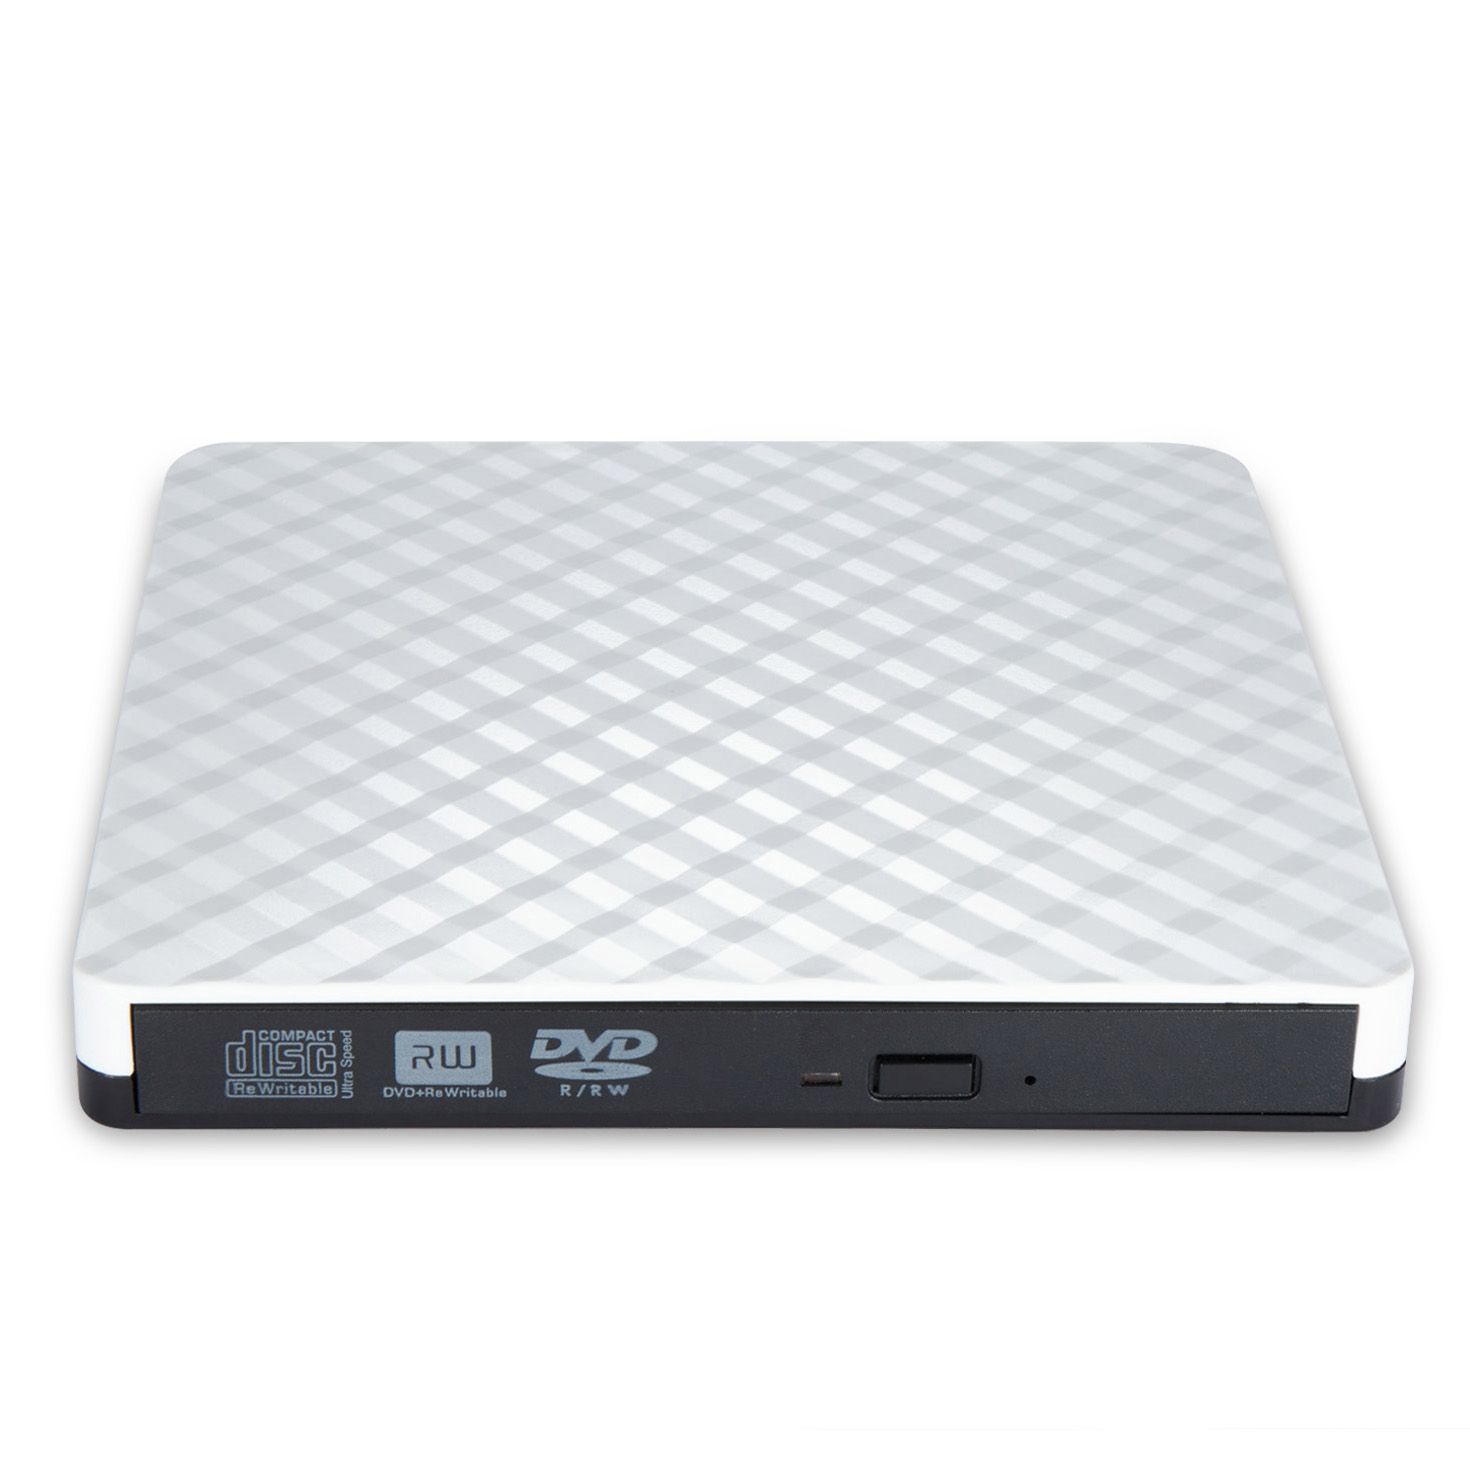 Slim DVD Burner Usb3.0 Corrugated External Drive